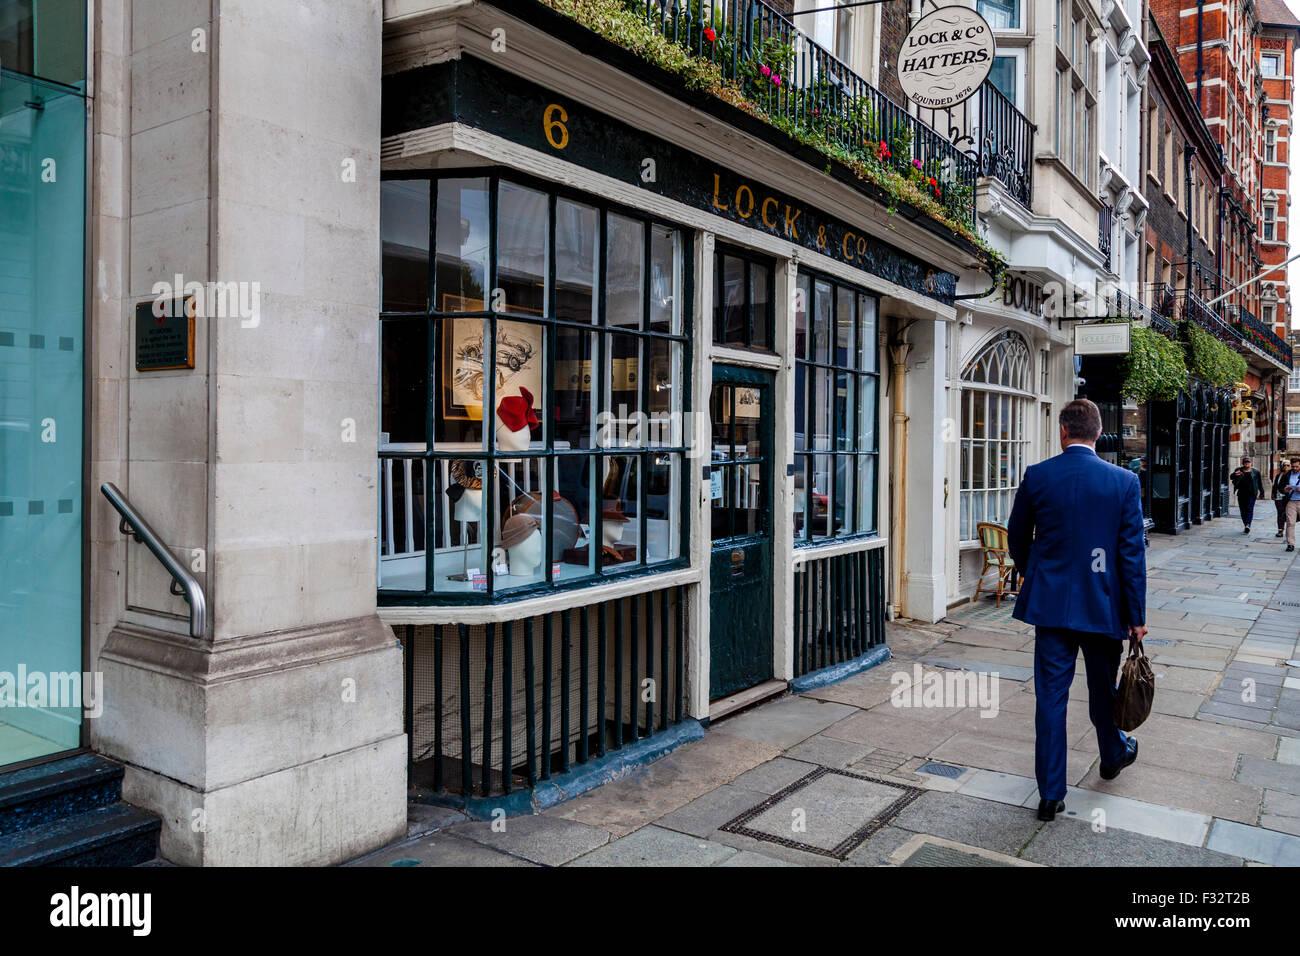 Lock & Co, Hatters, St James Street, London, UK Stock ...